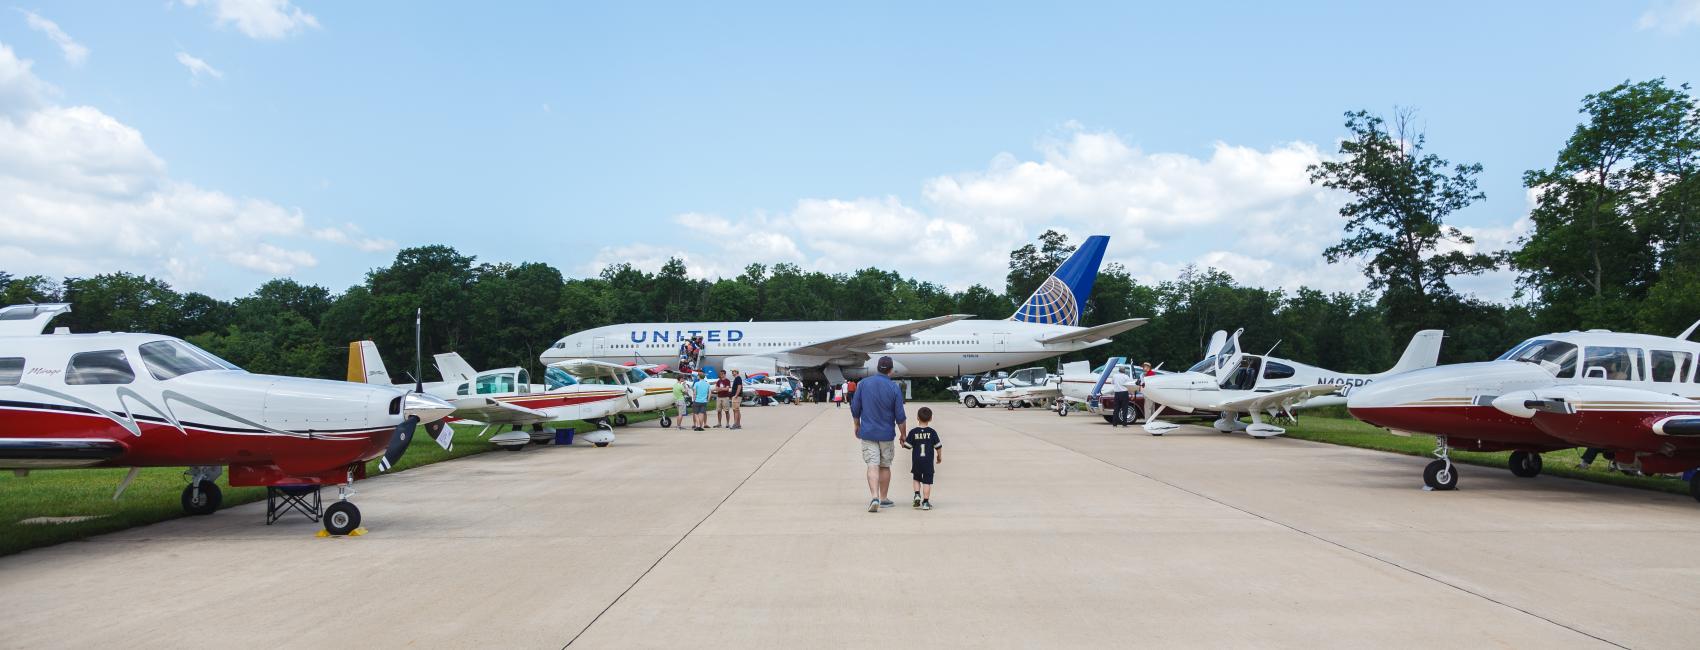 Aircraft at Become a Pilot Day 2014